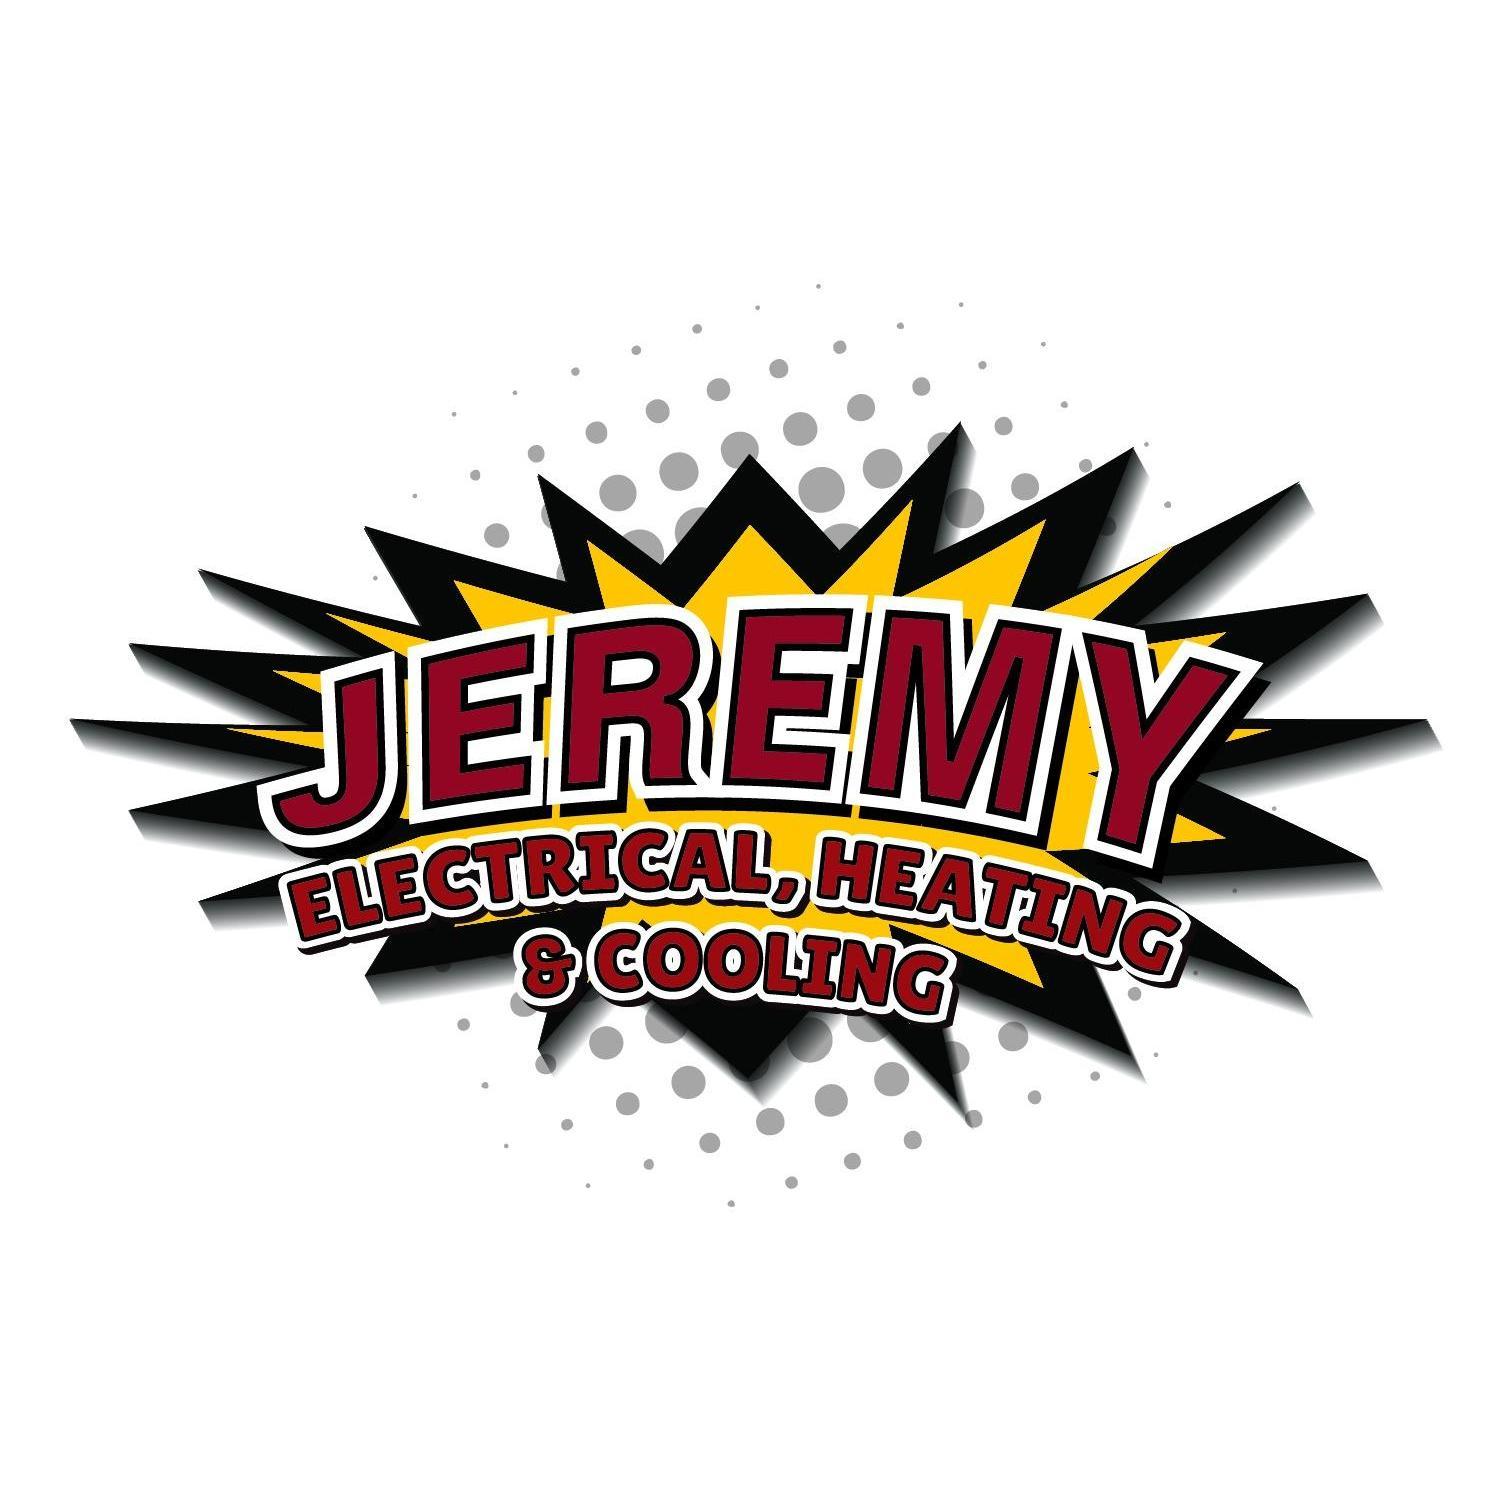 Jeremy Electrical - Mission, KS 66205 - (913)375-0070 | ShowMeLocal.com